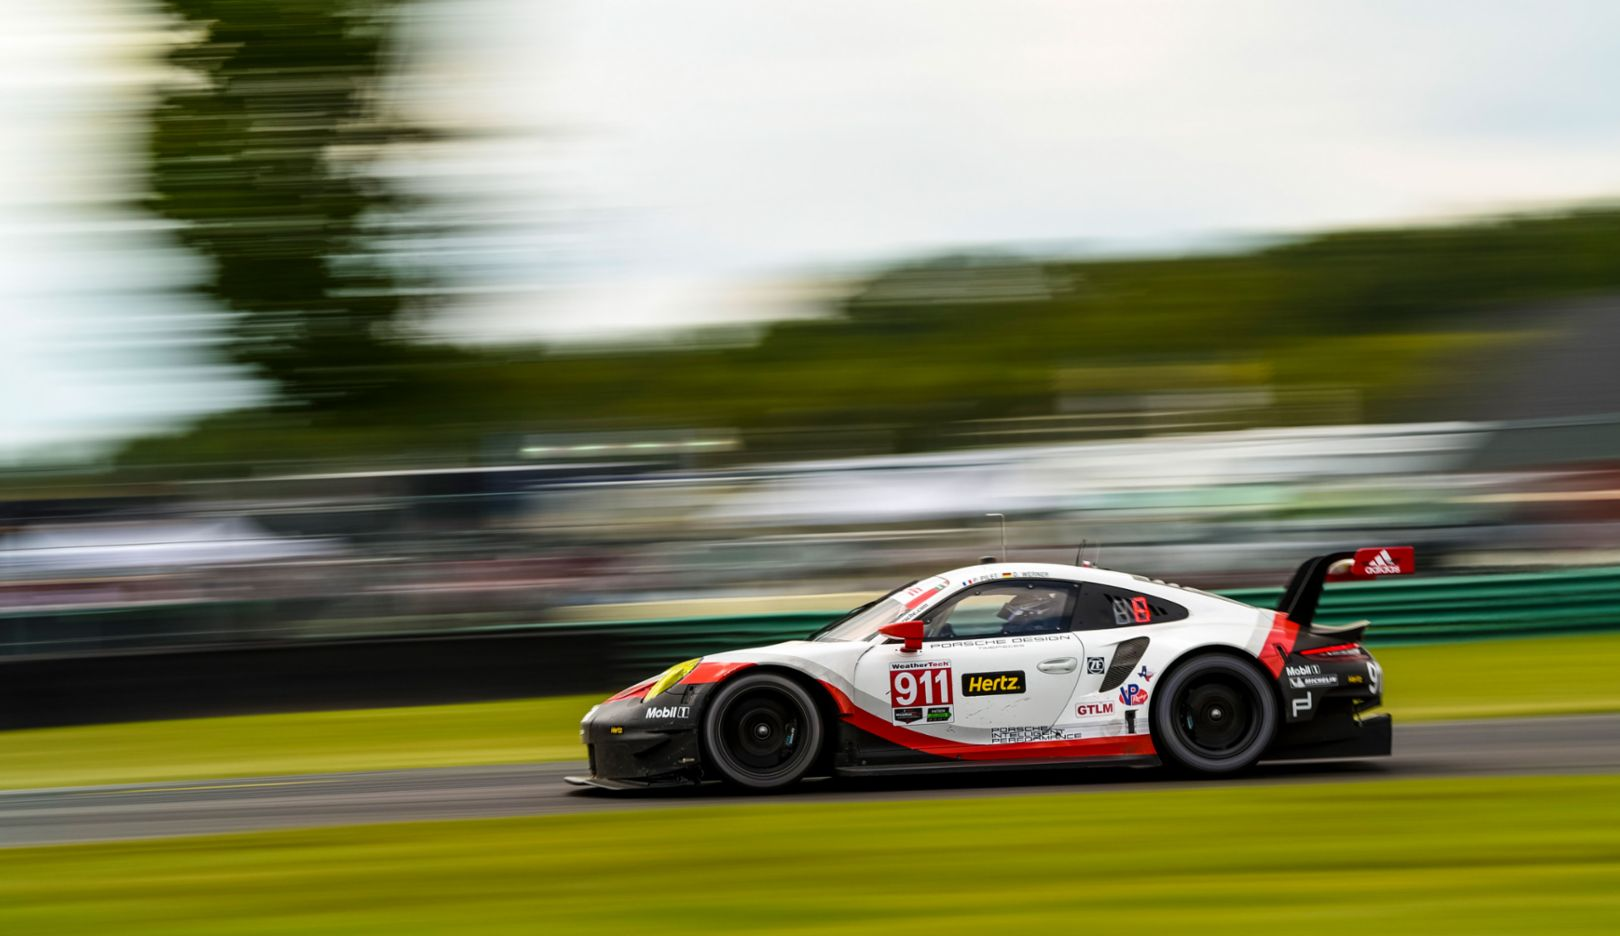 911 RSR, IMSA WeatherTech Sportscar Championship, Danville, USA, 2017, Porsche AG